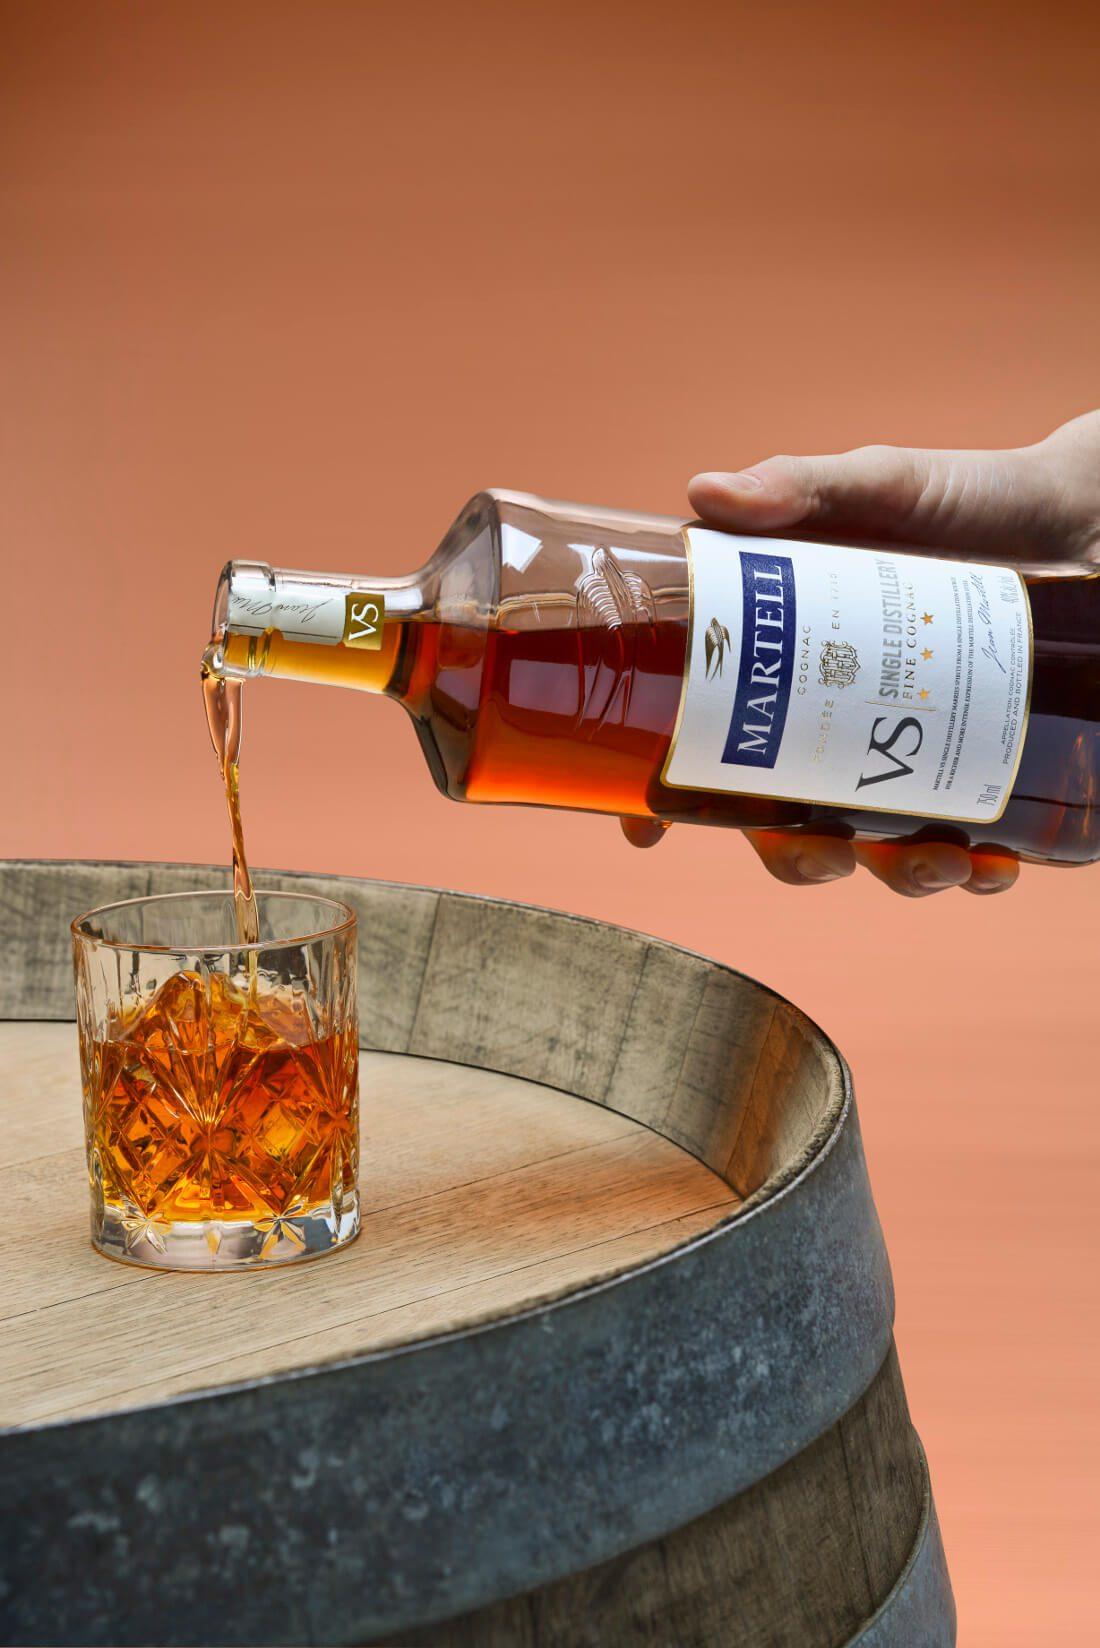 martell-vs-single-distillery-digital-picture-raw-visual-22